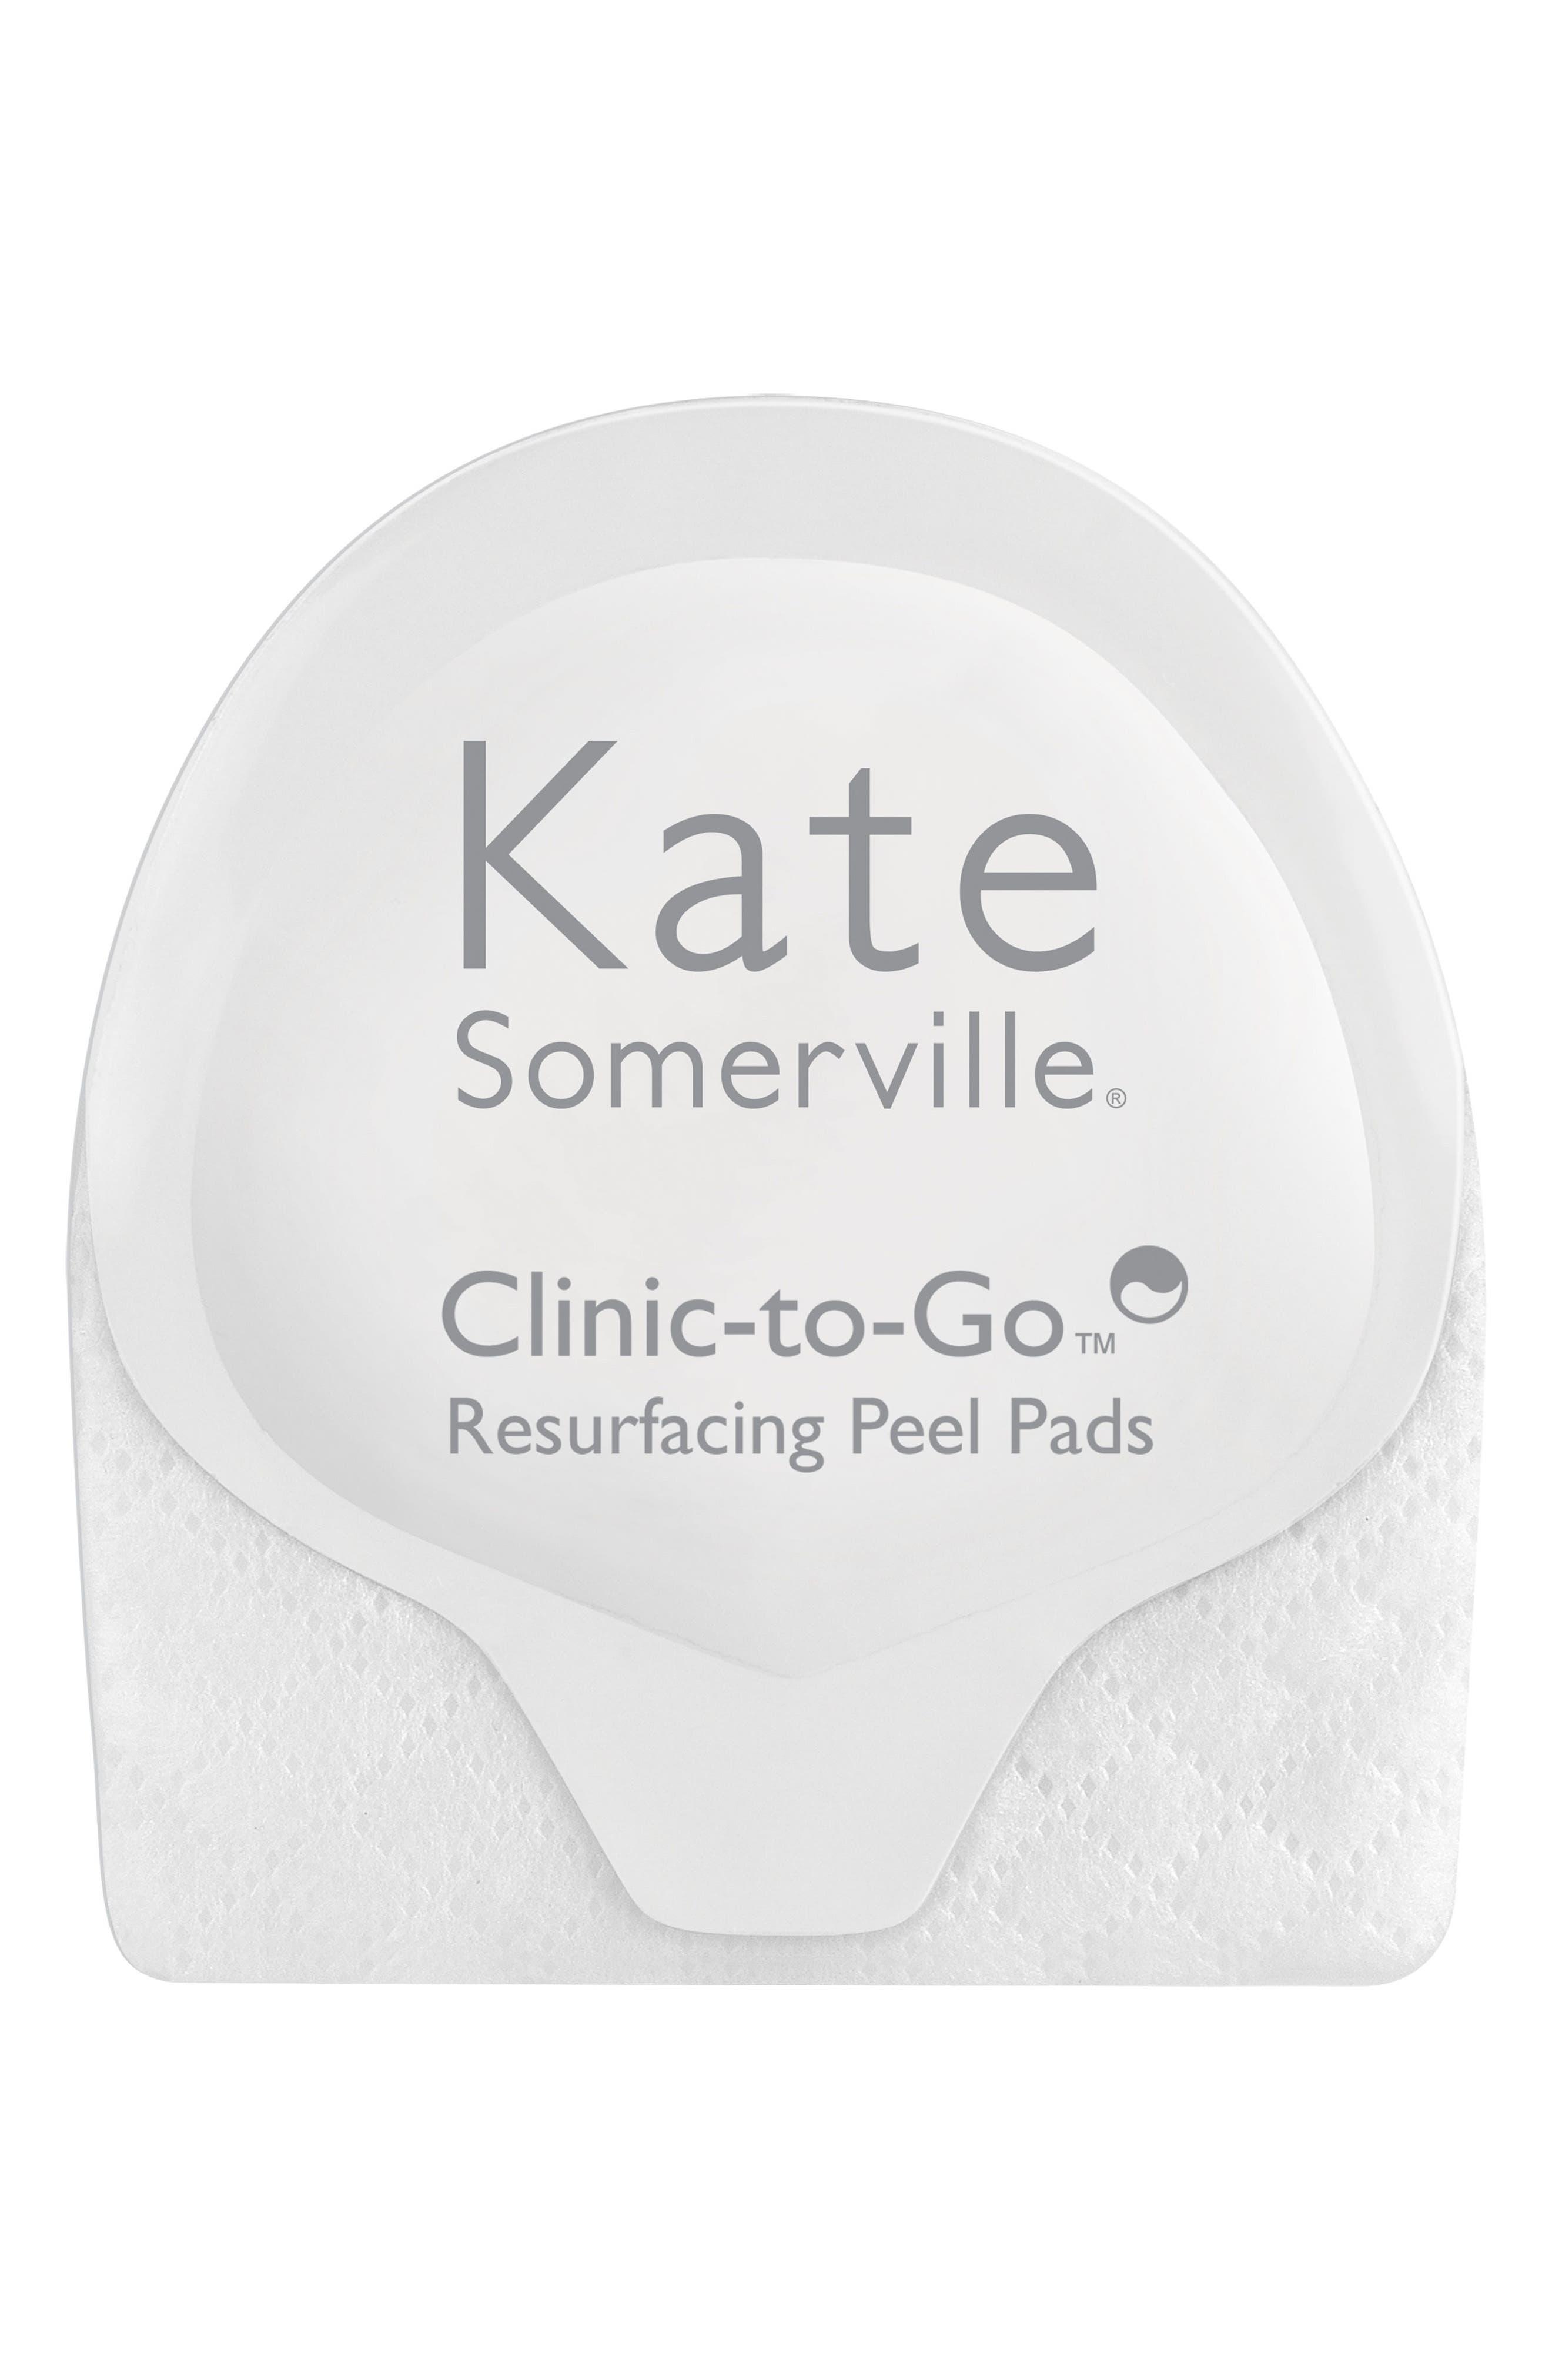 'Clinic-to-Go' Resurfacing Peel Pads,                         Main,                         color, 000